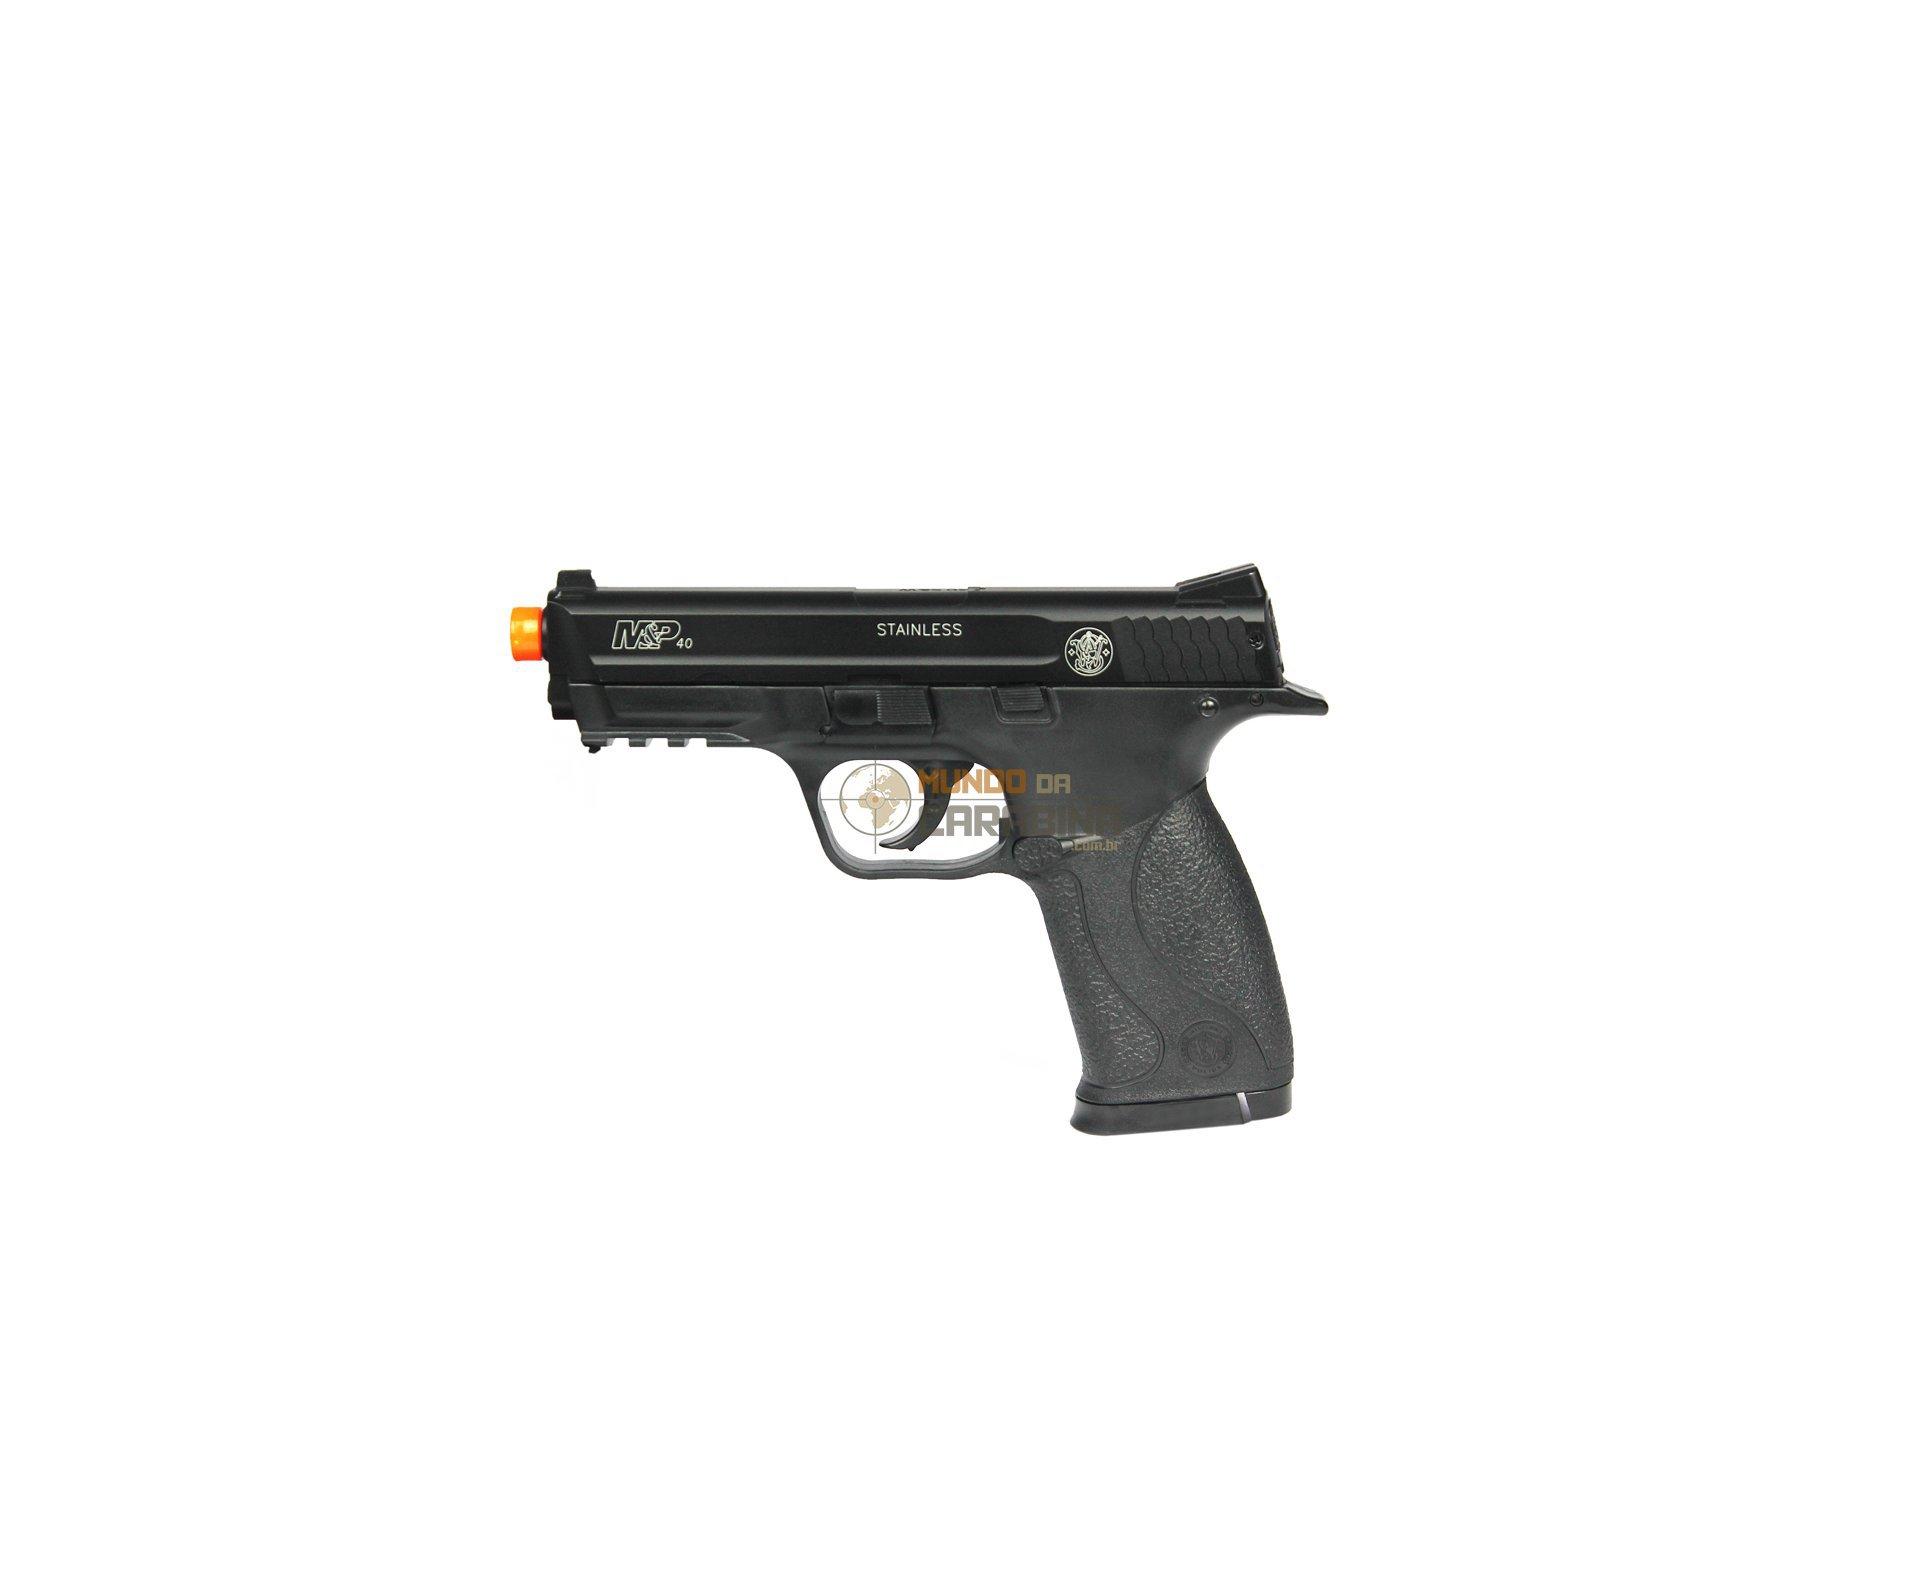 Pistola De Airsoft Smith&wesson Mp 40 Semi Metal + 4000 Esferas 0,12g + Capa Almofadada - Cyber Gun